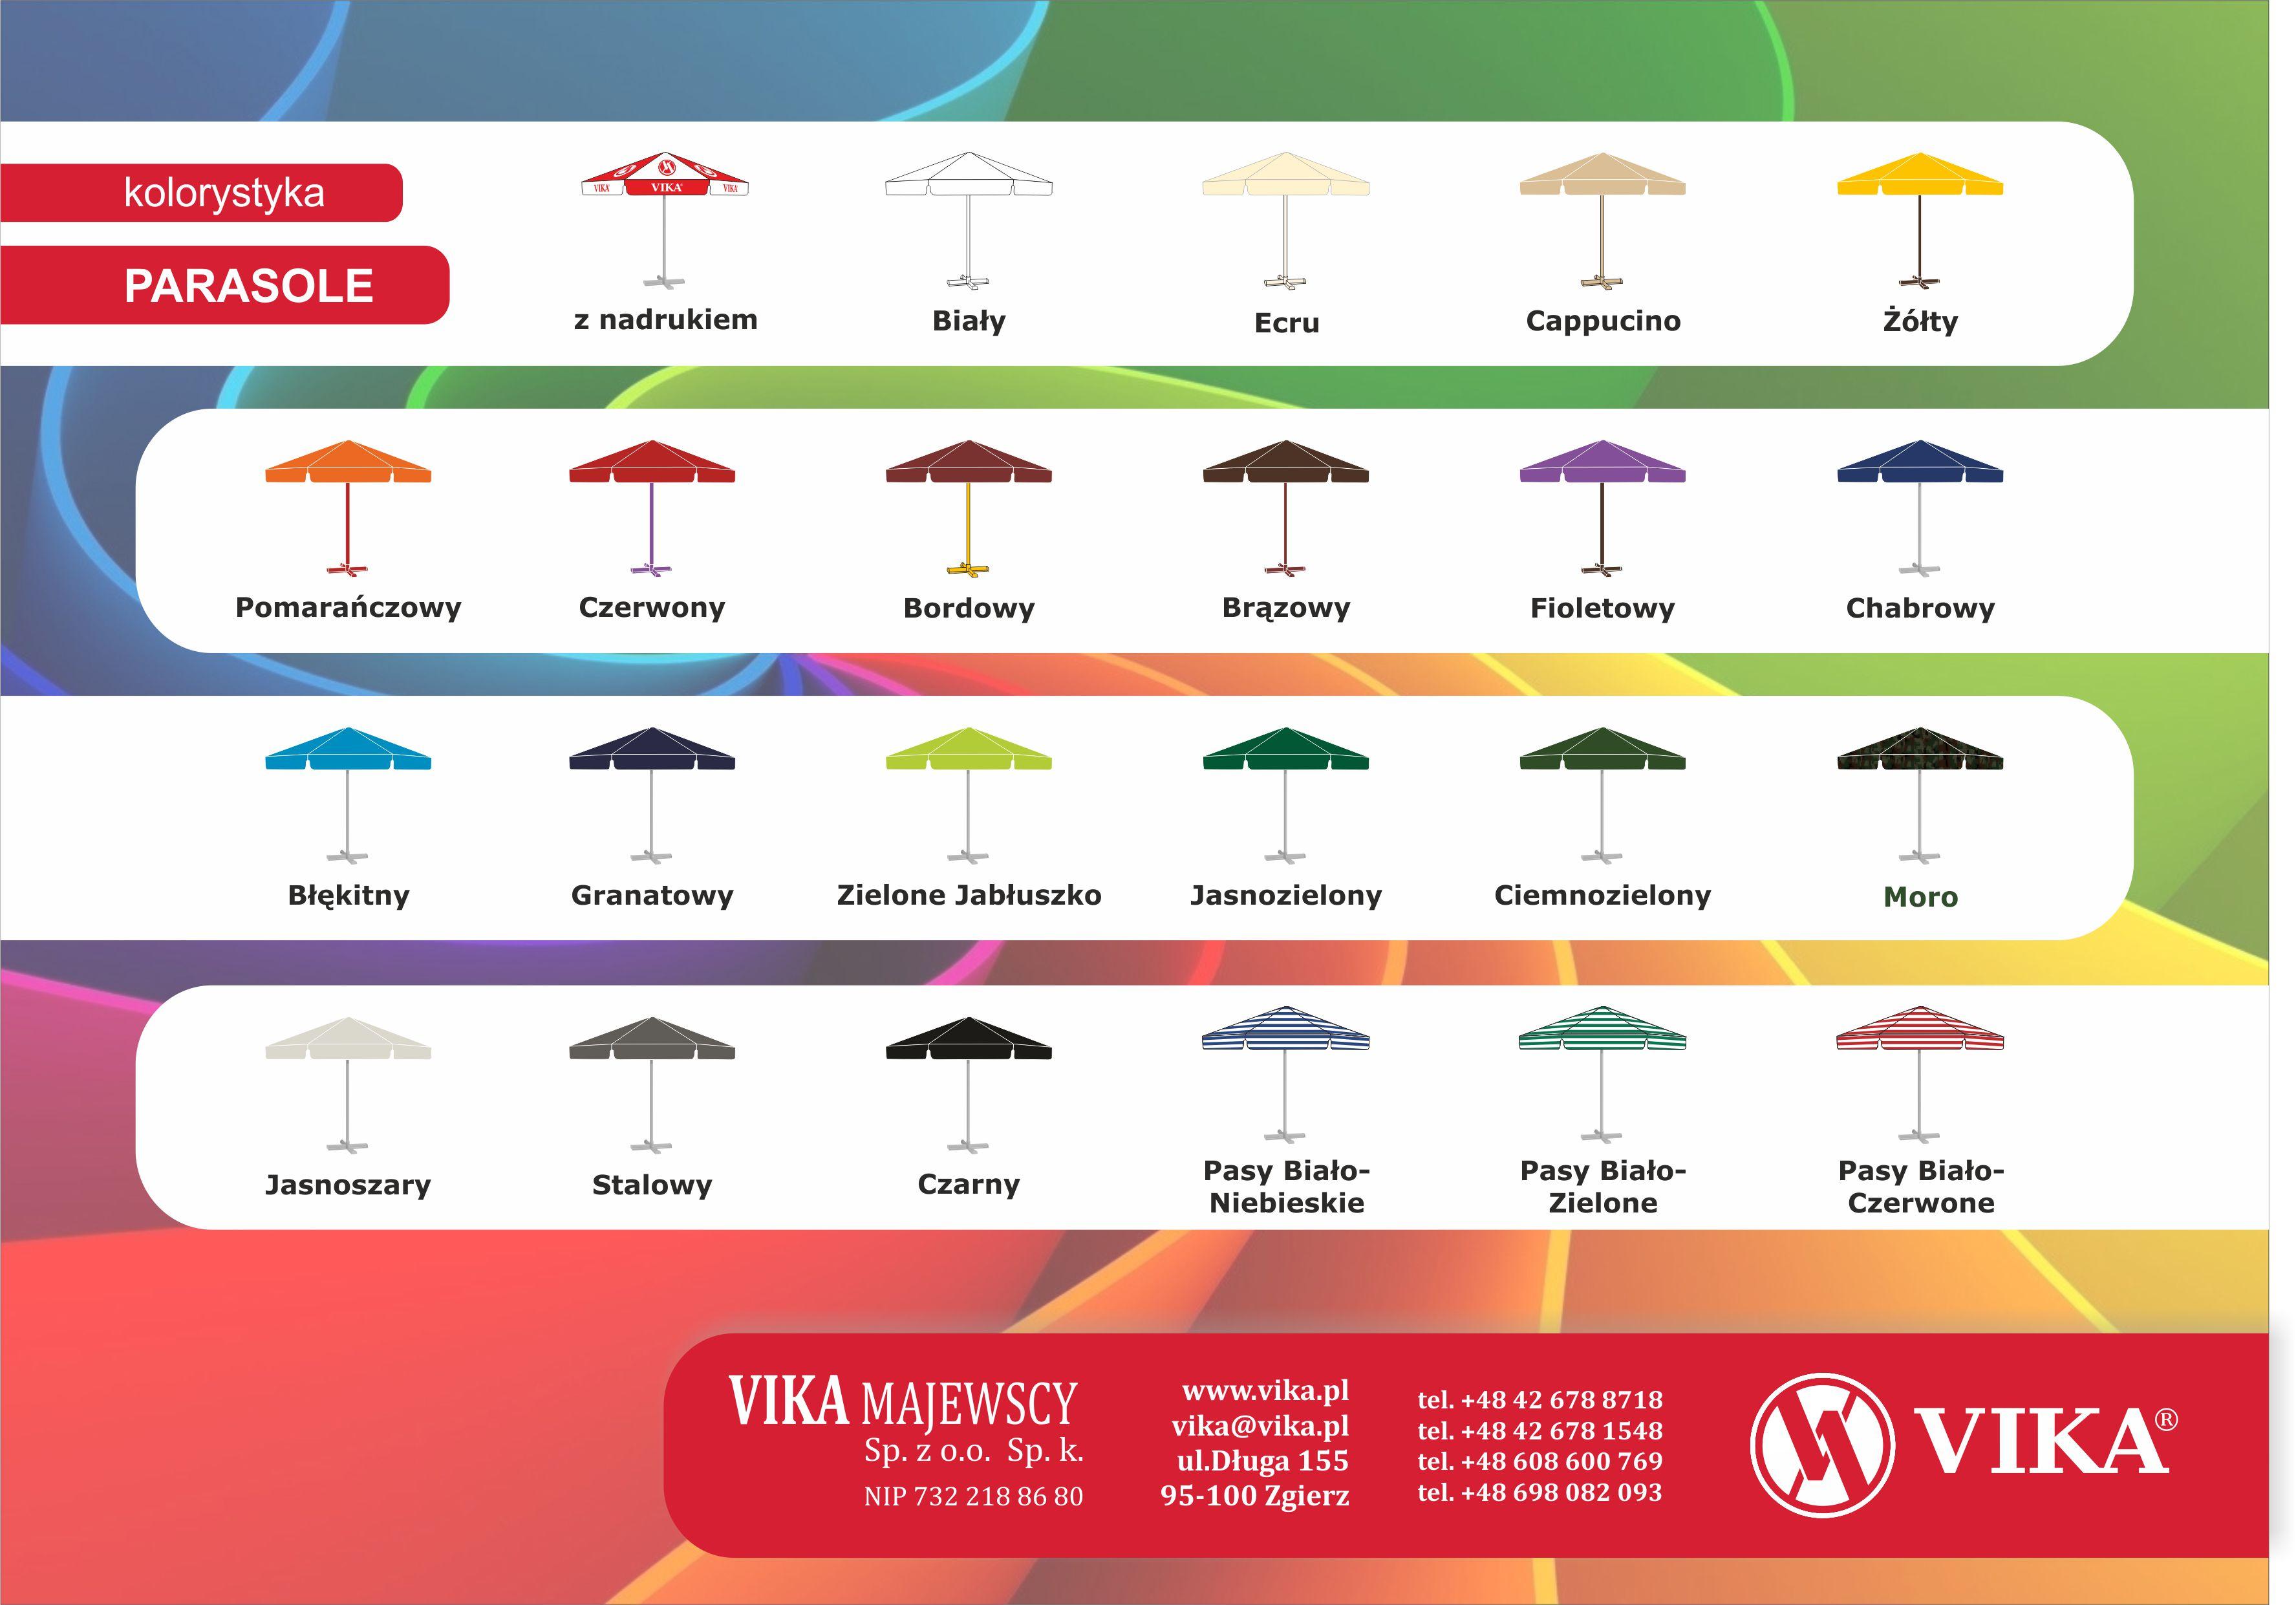 Kolorystyka parasoli do ogrodu